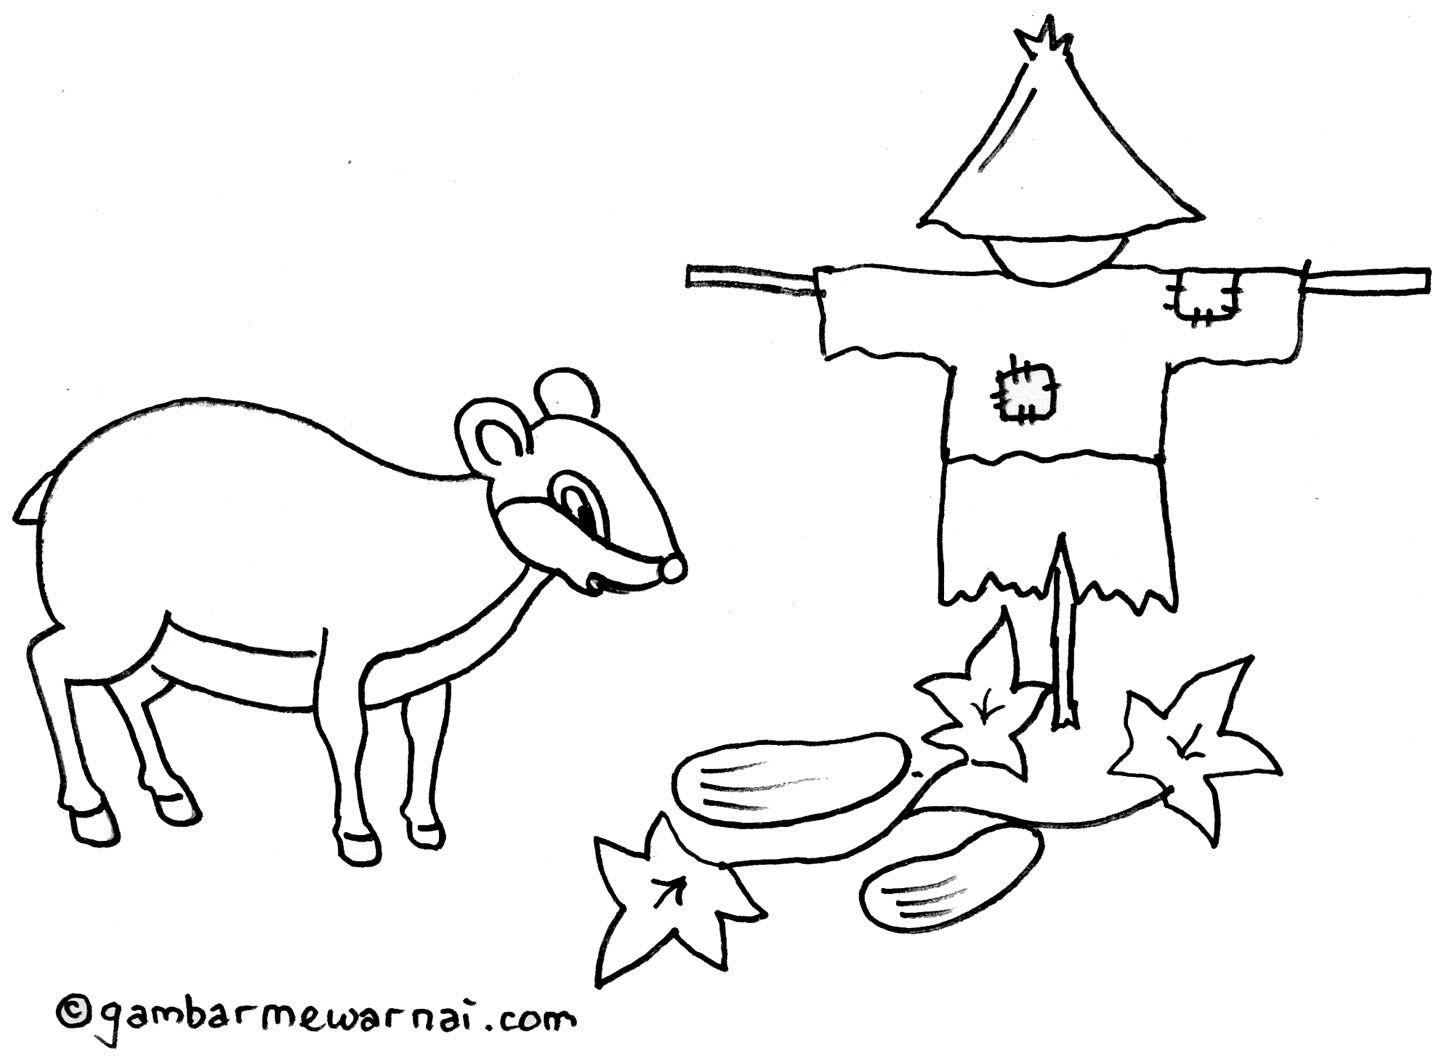 Gambar Mewarnai Kancil Mencuri Ketimun Dokument Animals Pets